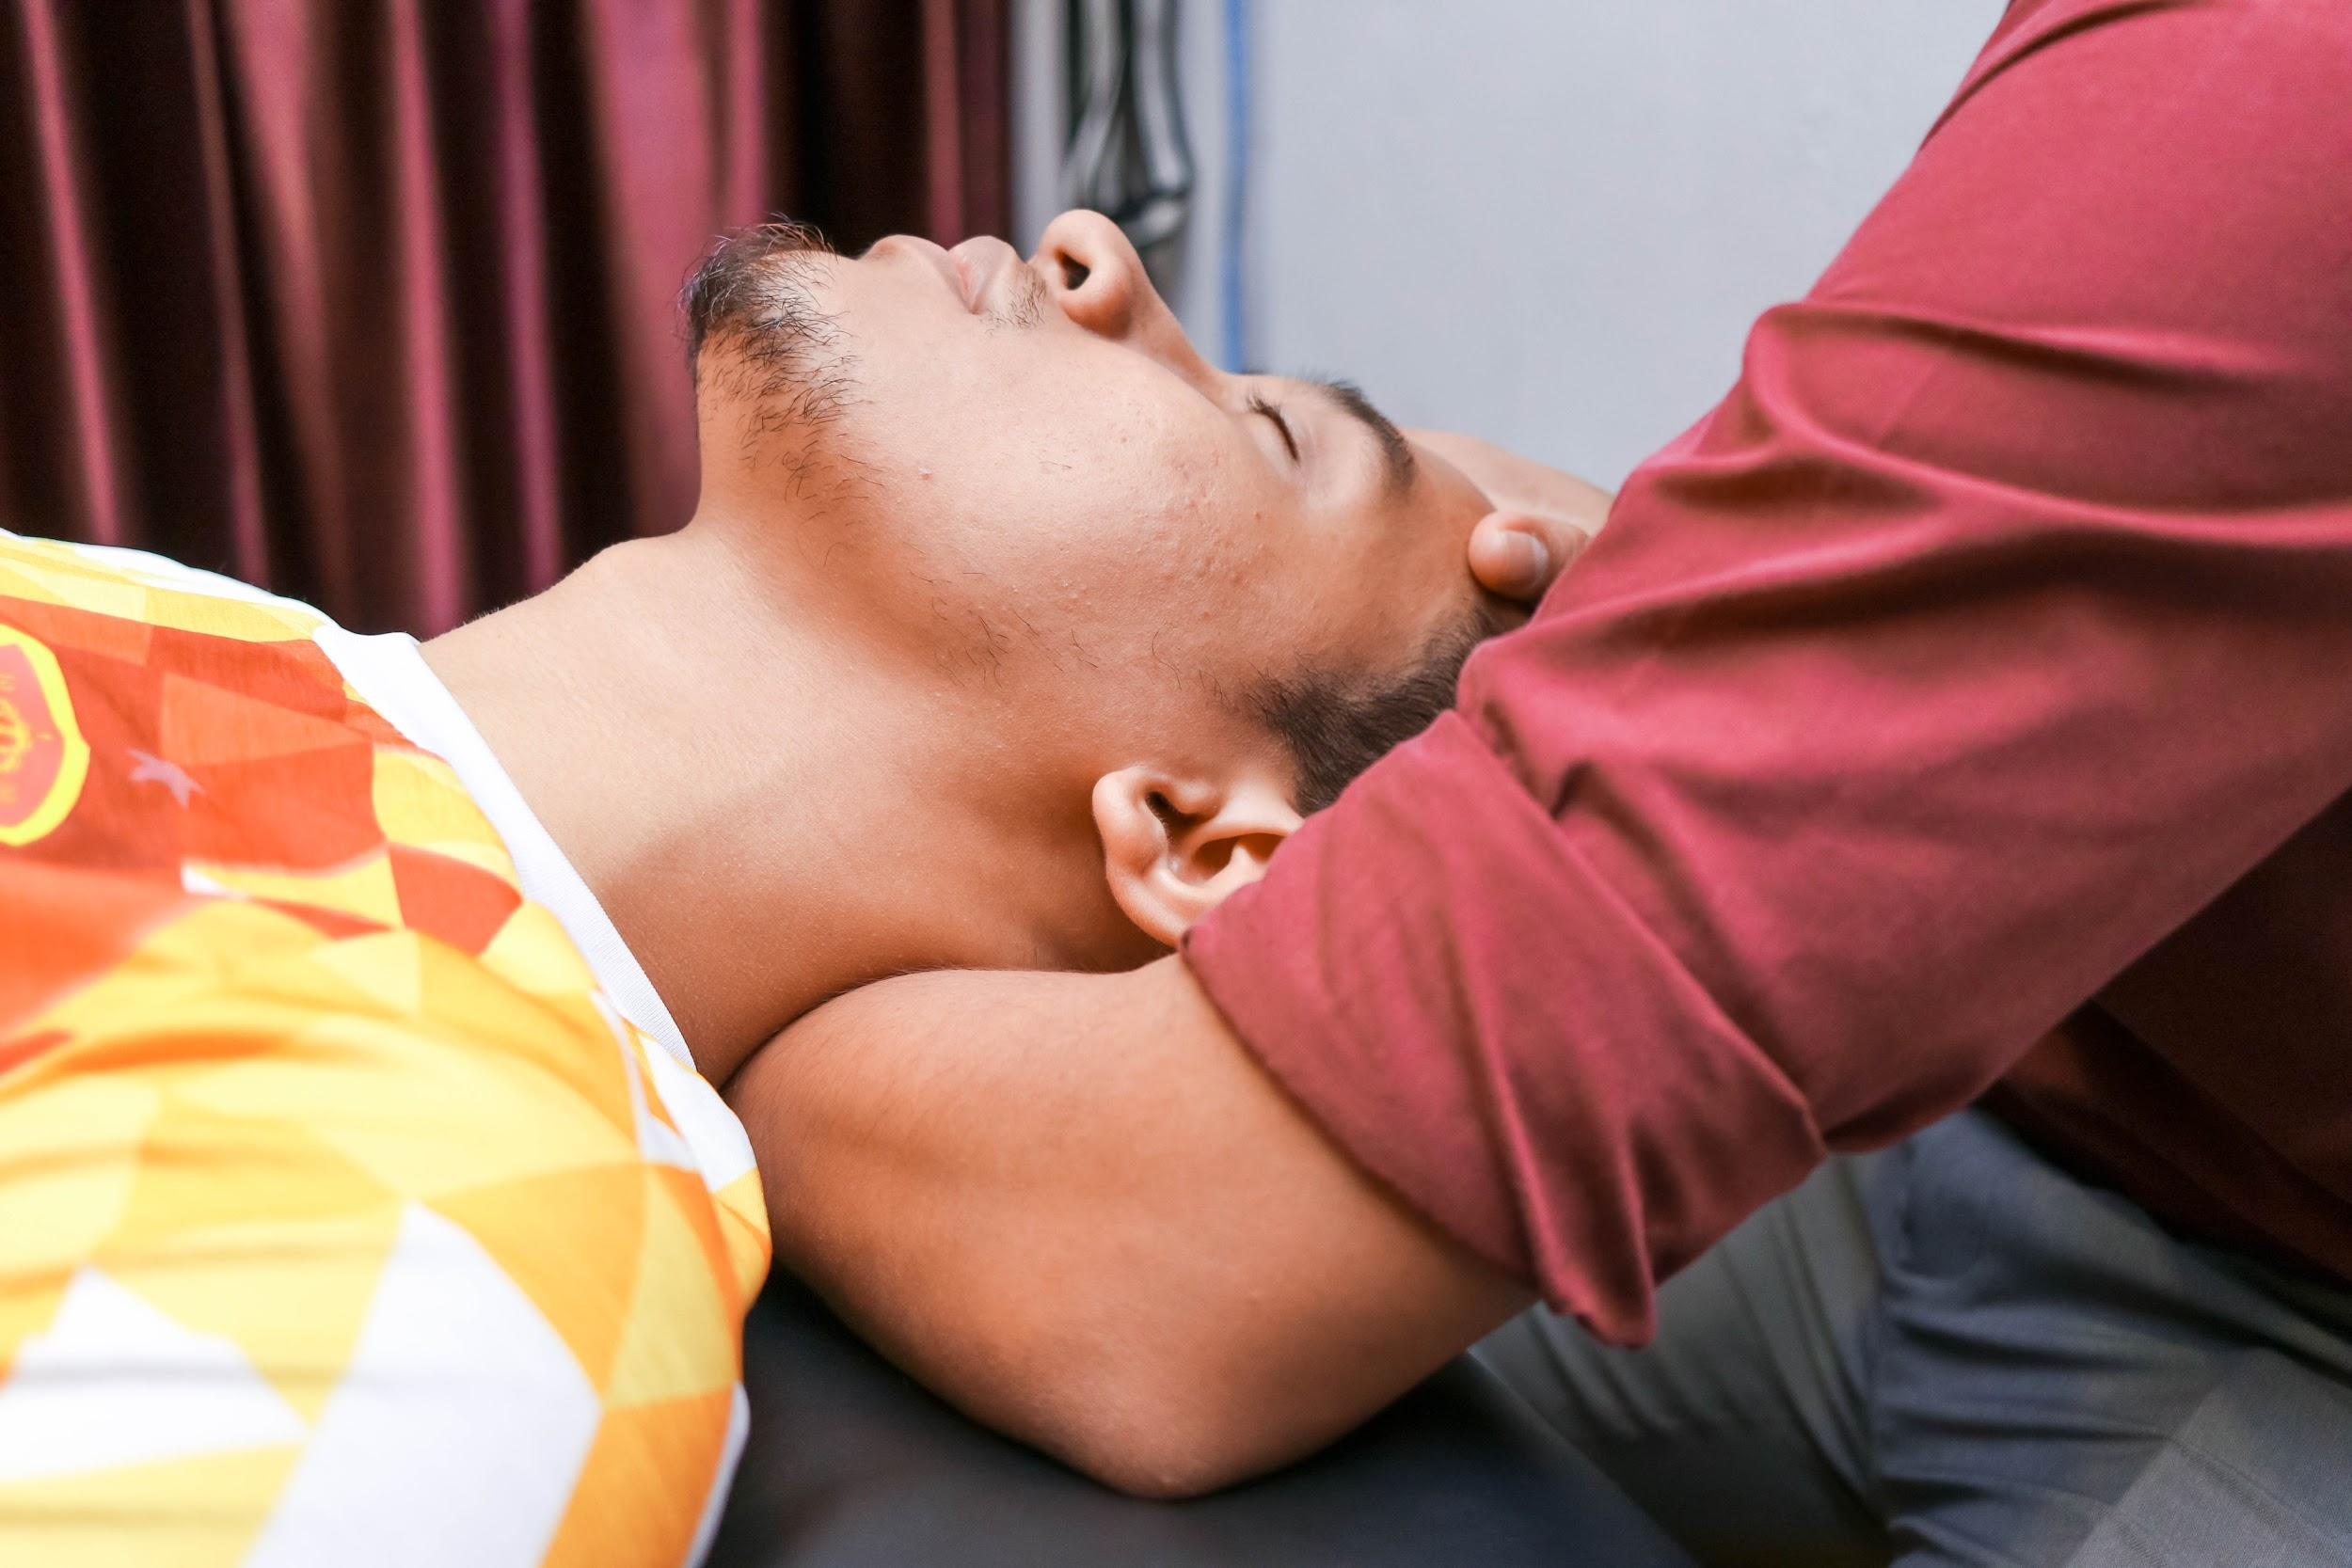 Pusat Rawatan Sakit Belakang Murah